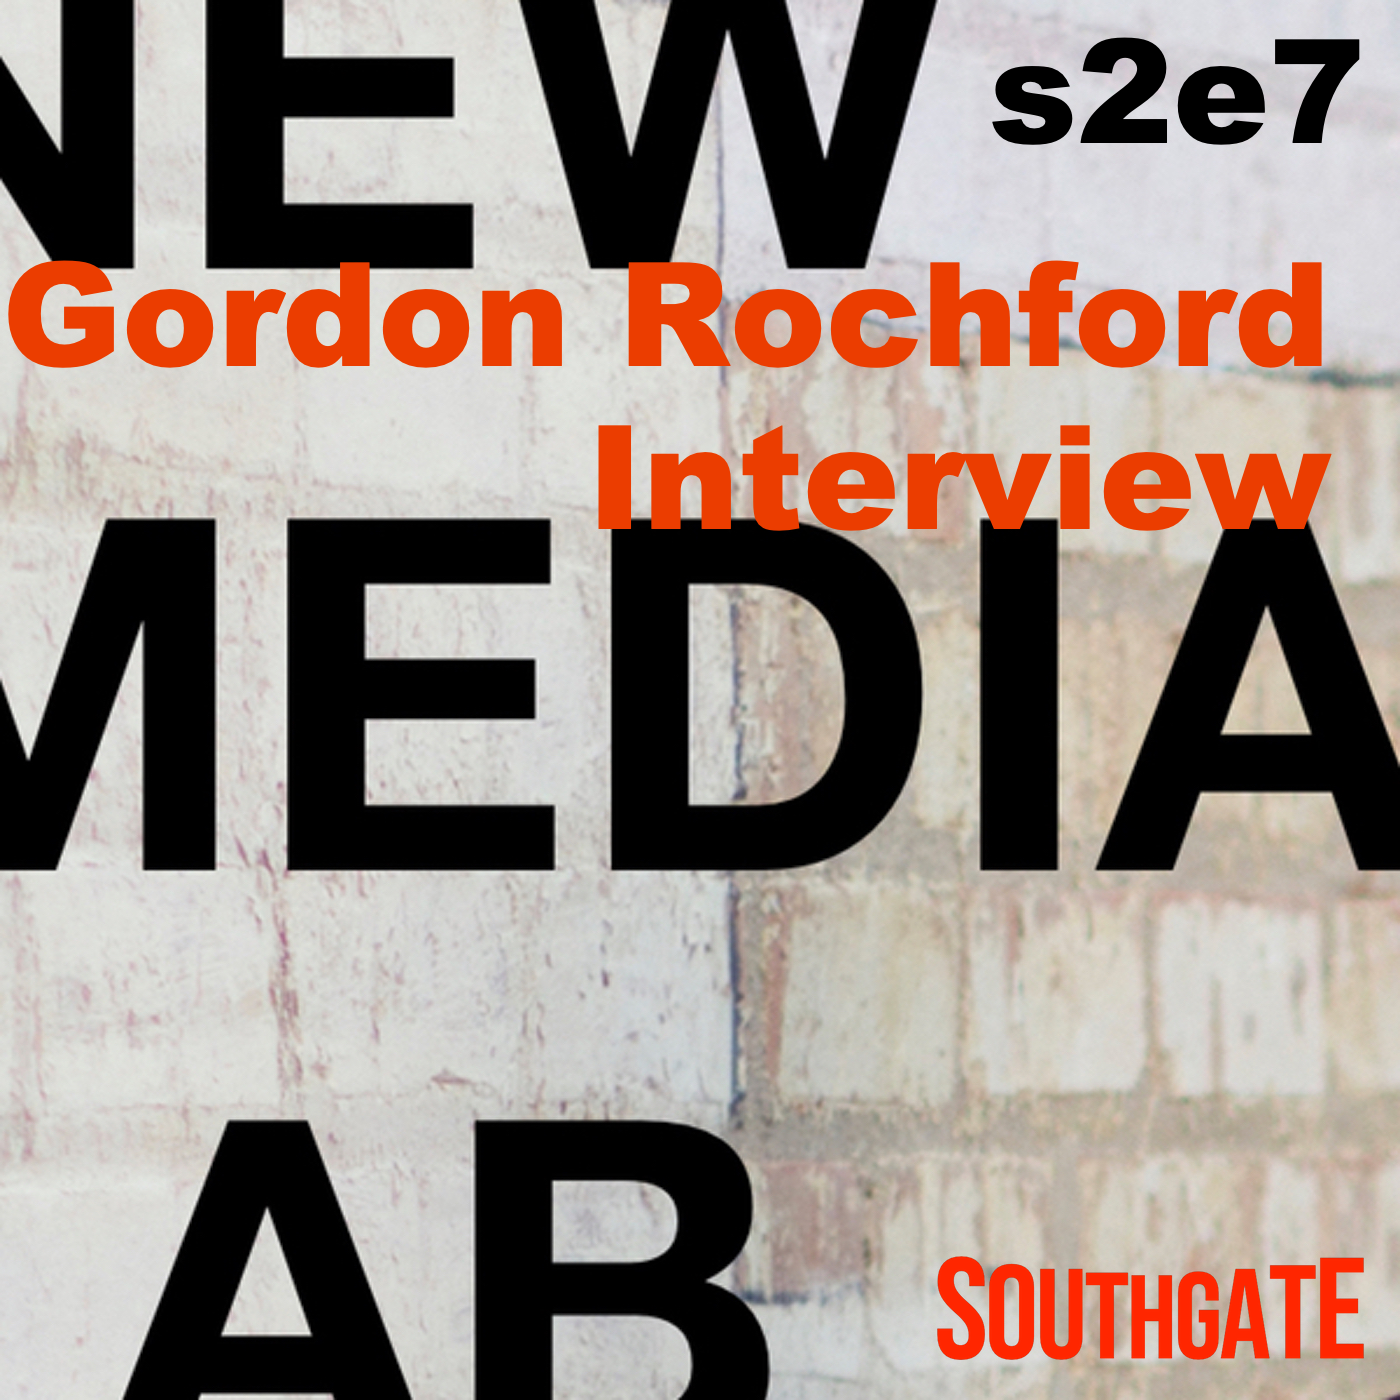 Gordon Rochford Interview